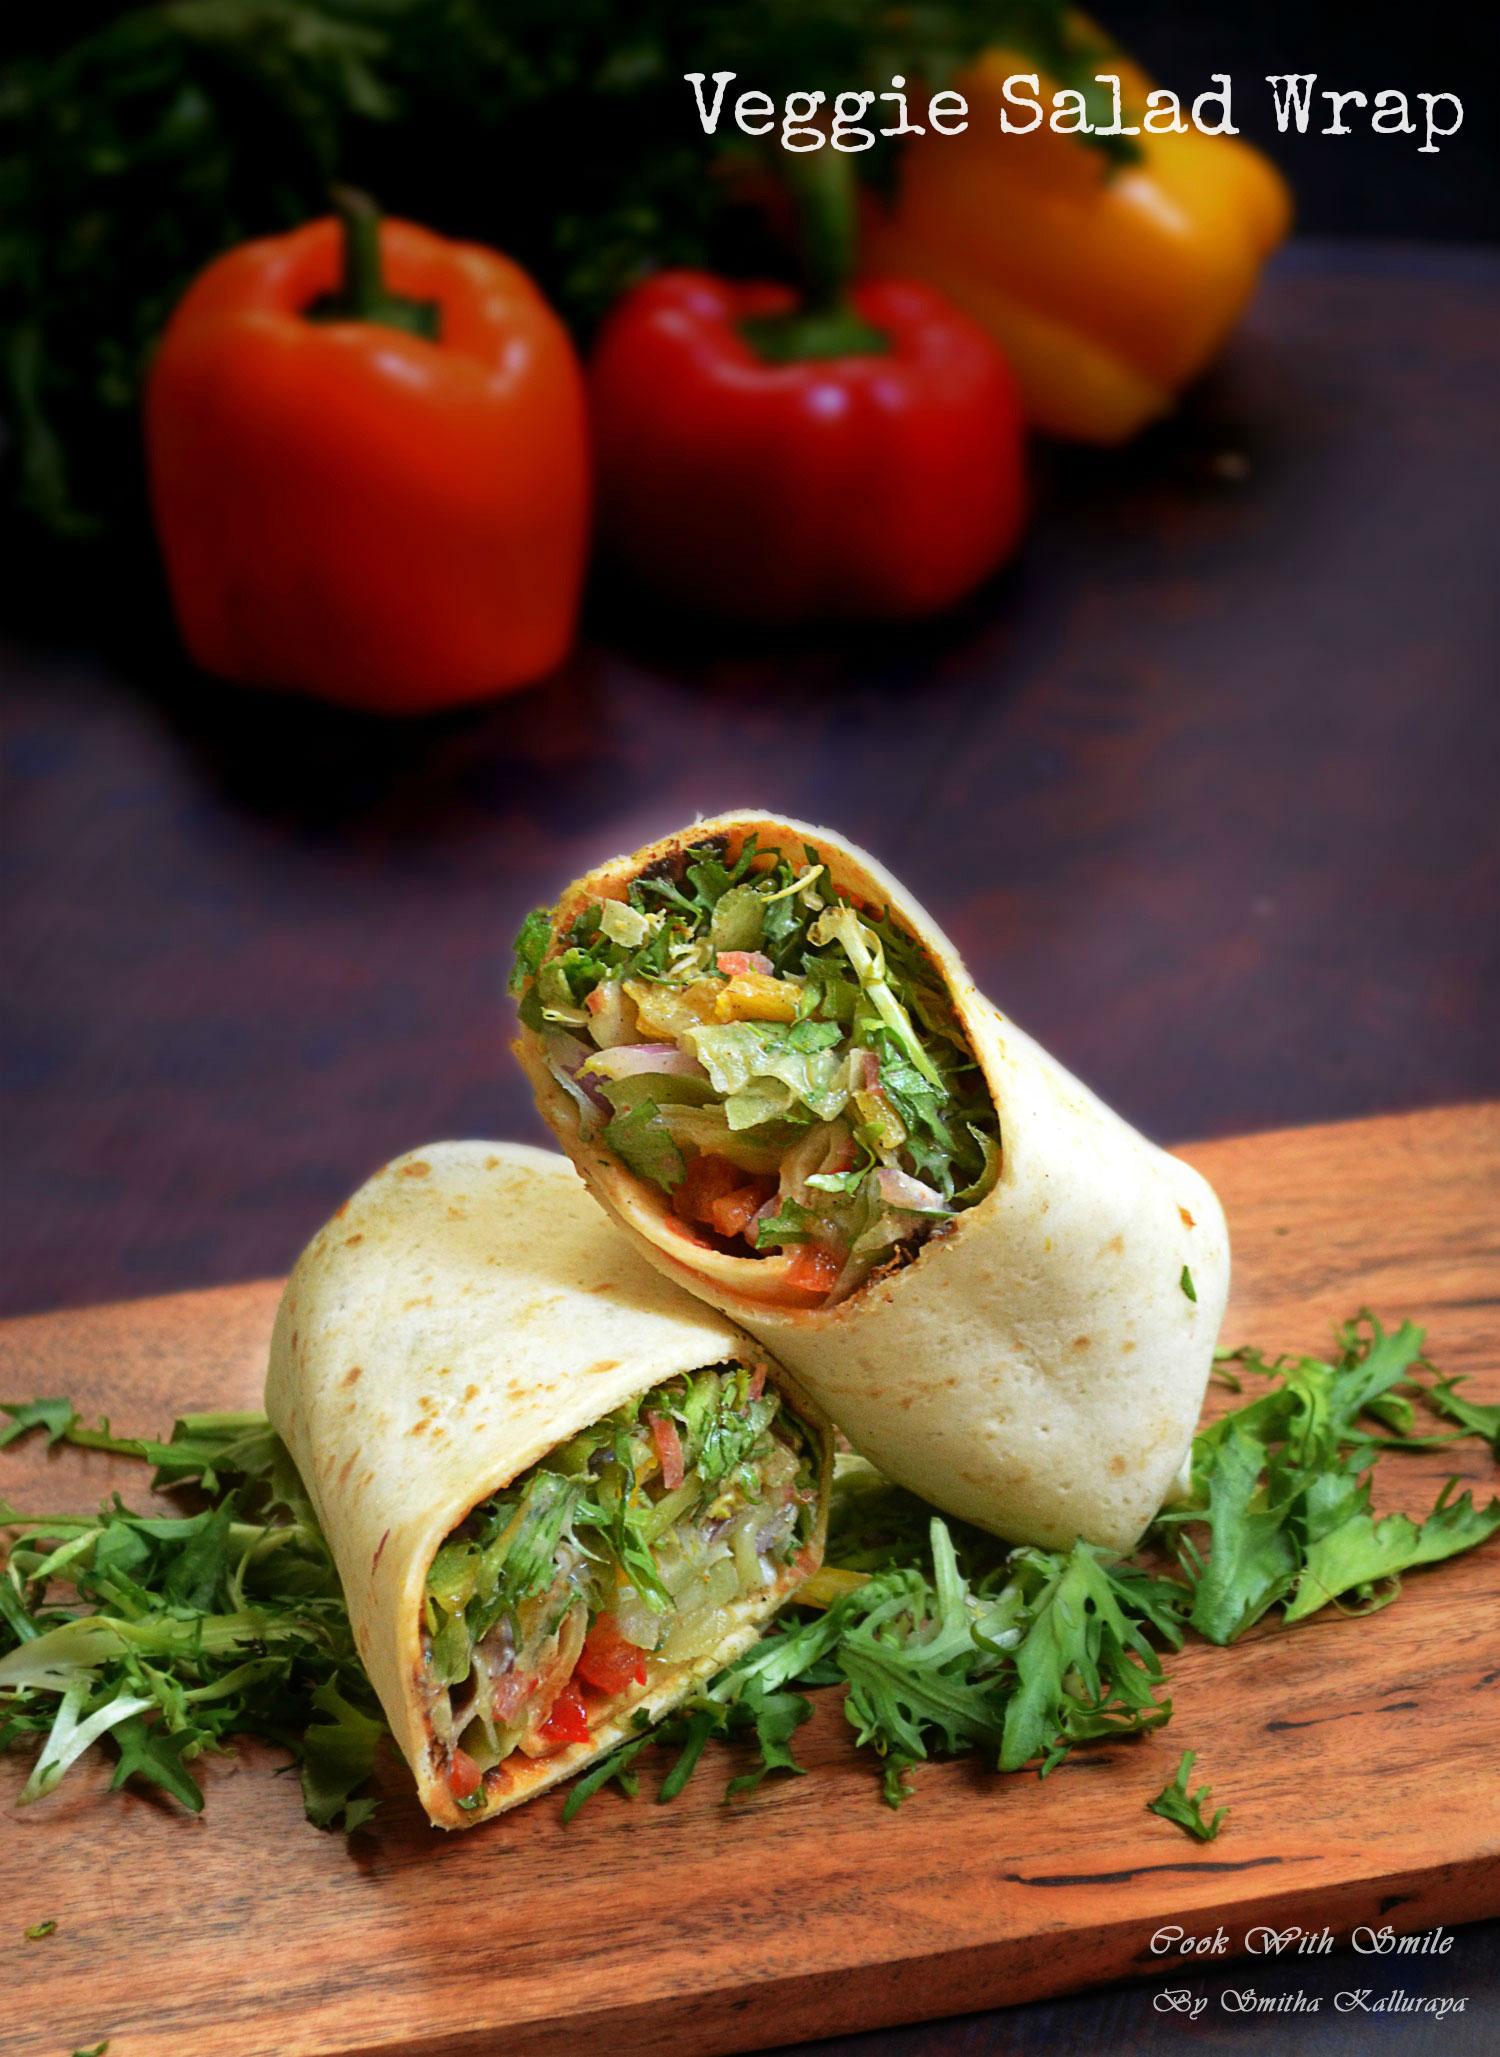 Veg salad wrap recipe